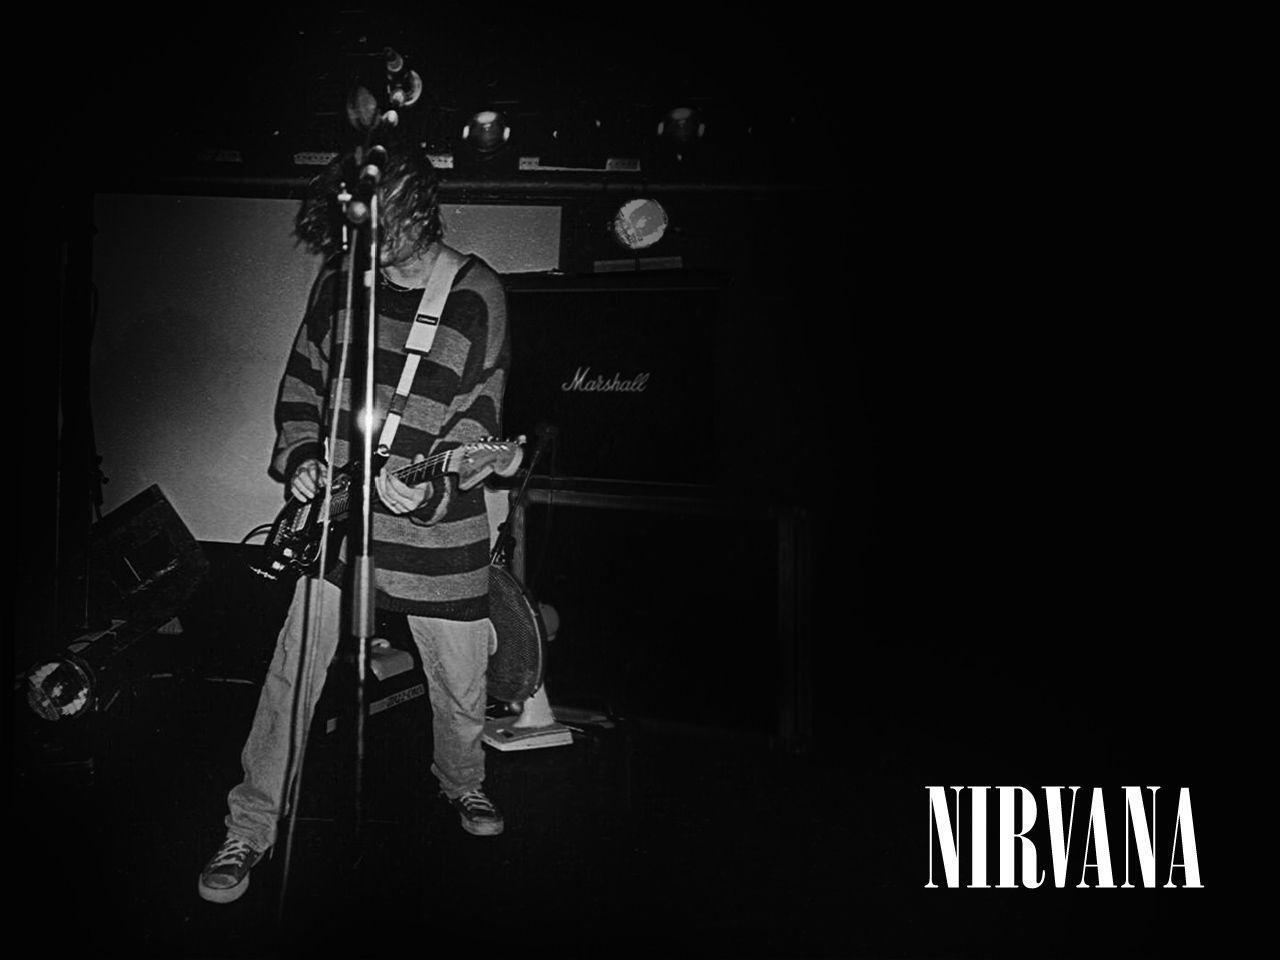 Nirvana Logo Wallpapers - Wallpaper Cave Oasis Band Logo